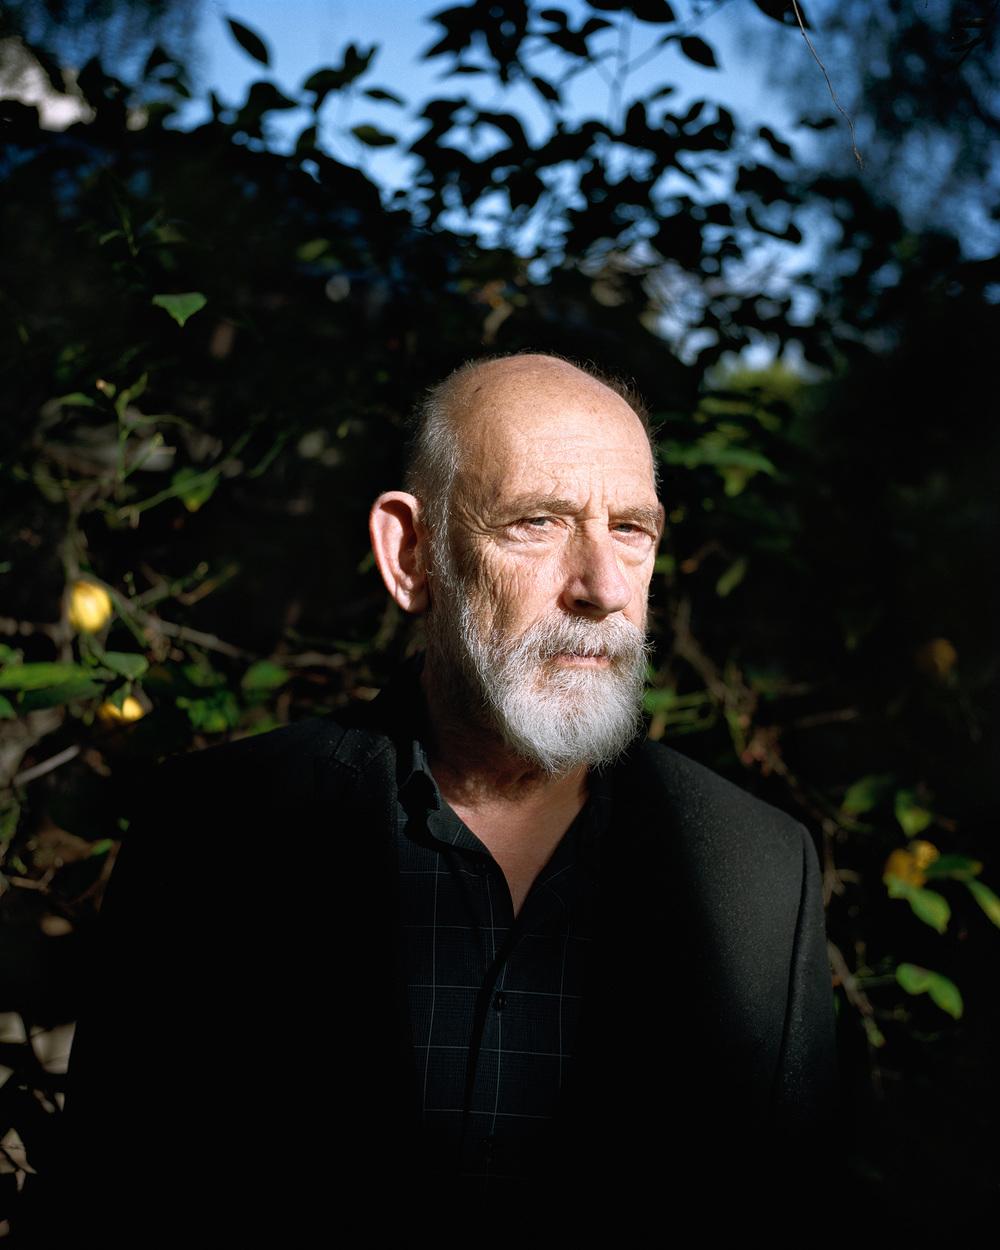 Leonard Susskind at his home in Palo Alto, California